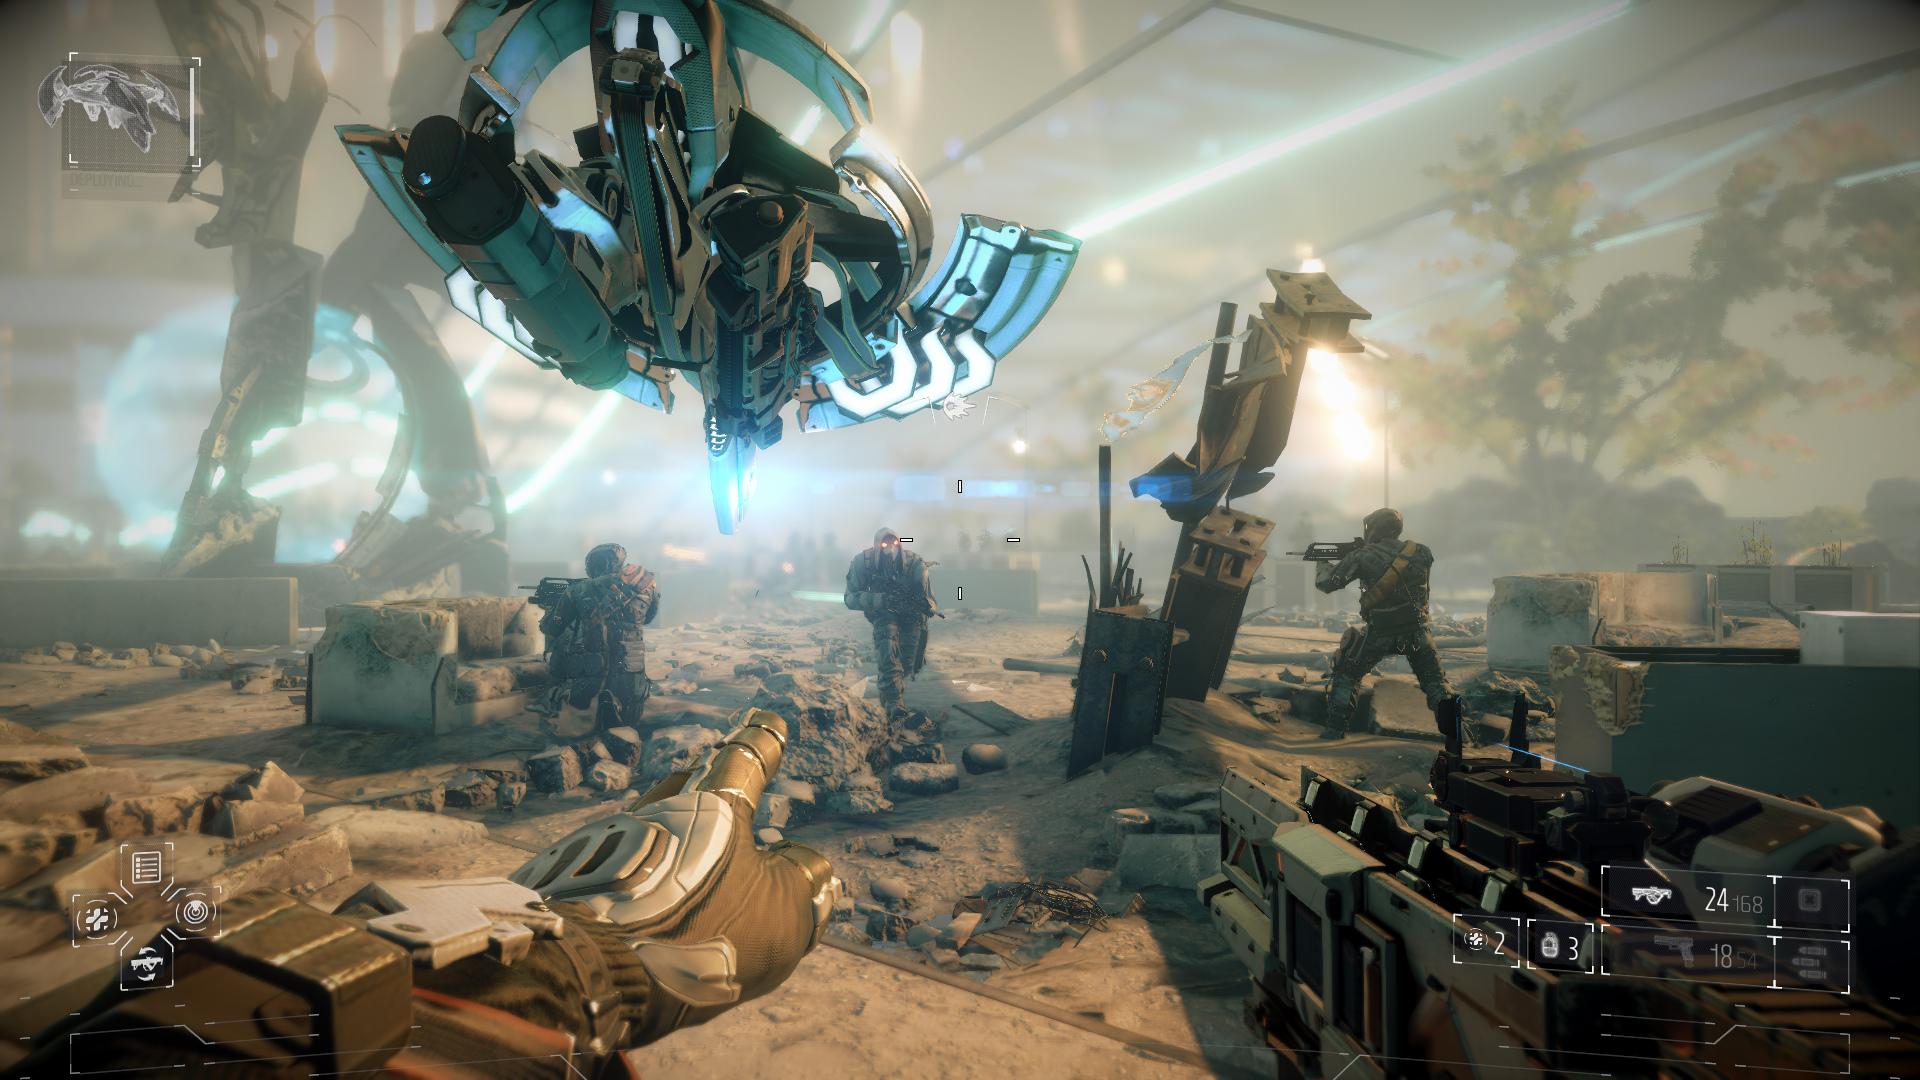 NEW KILLZONE SHADOWFALL PICS + Vids (Nextgen Graphics King!) - System Wars - GameSpot